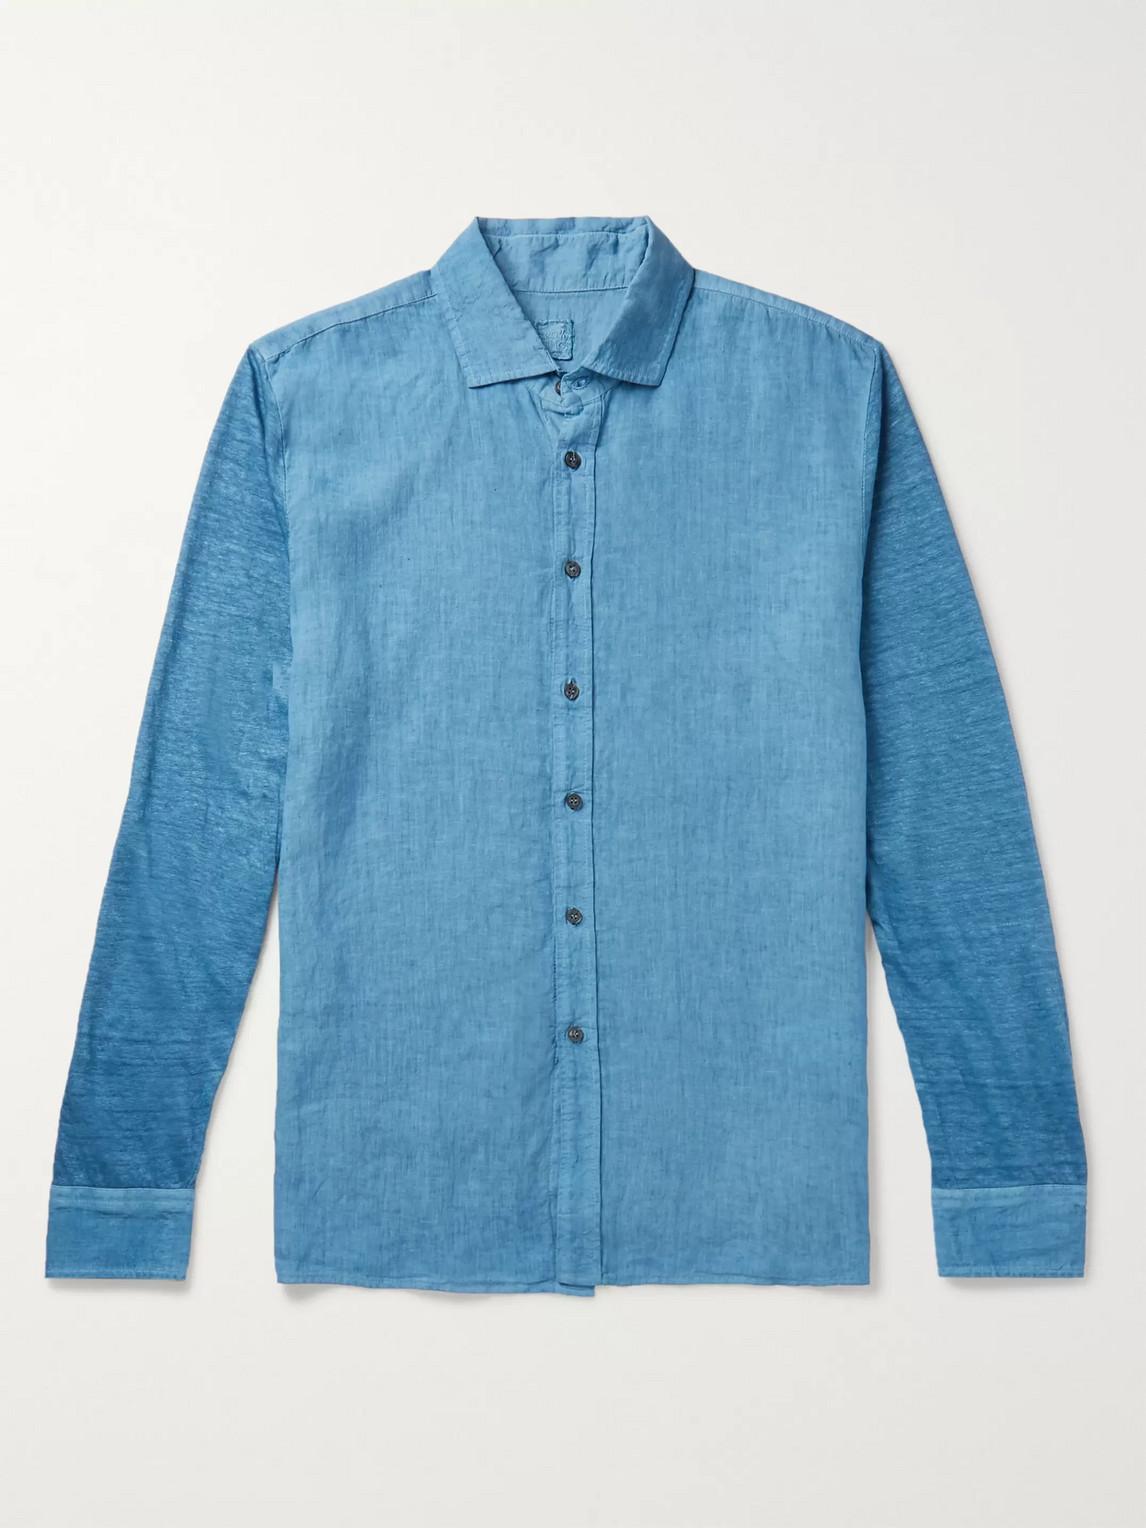 120% Linen-chambray Shirt In Blue